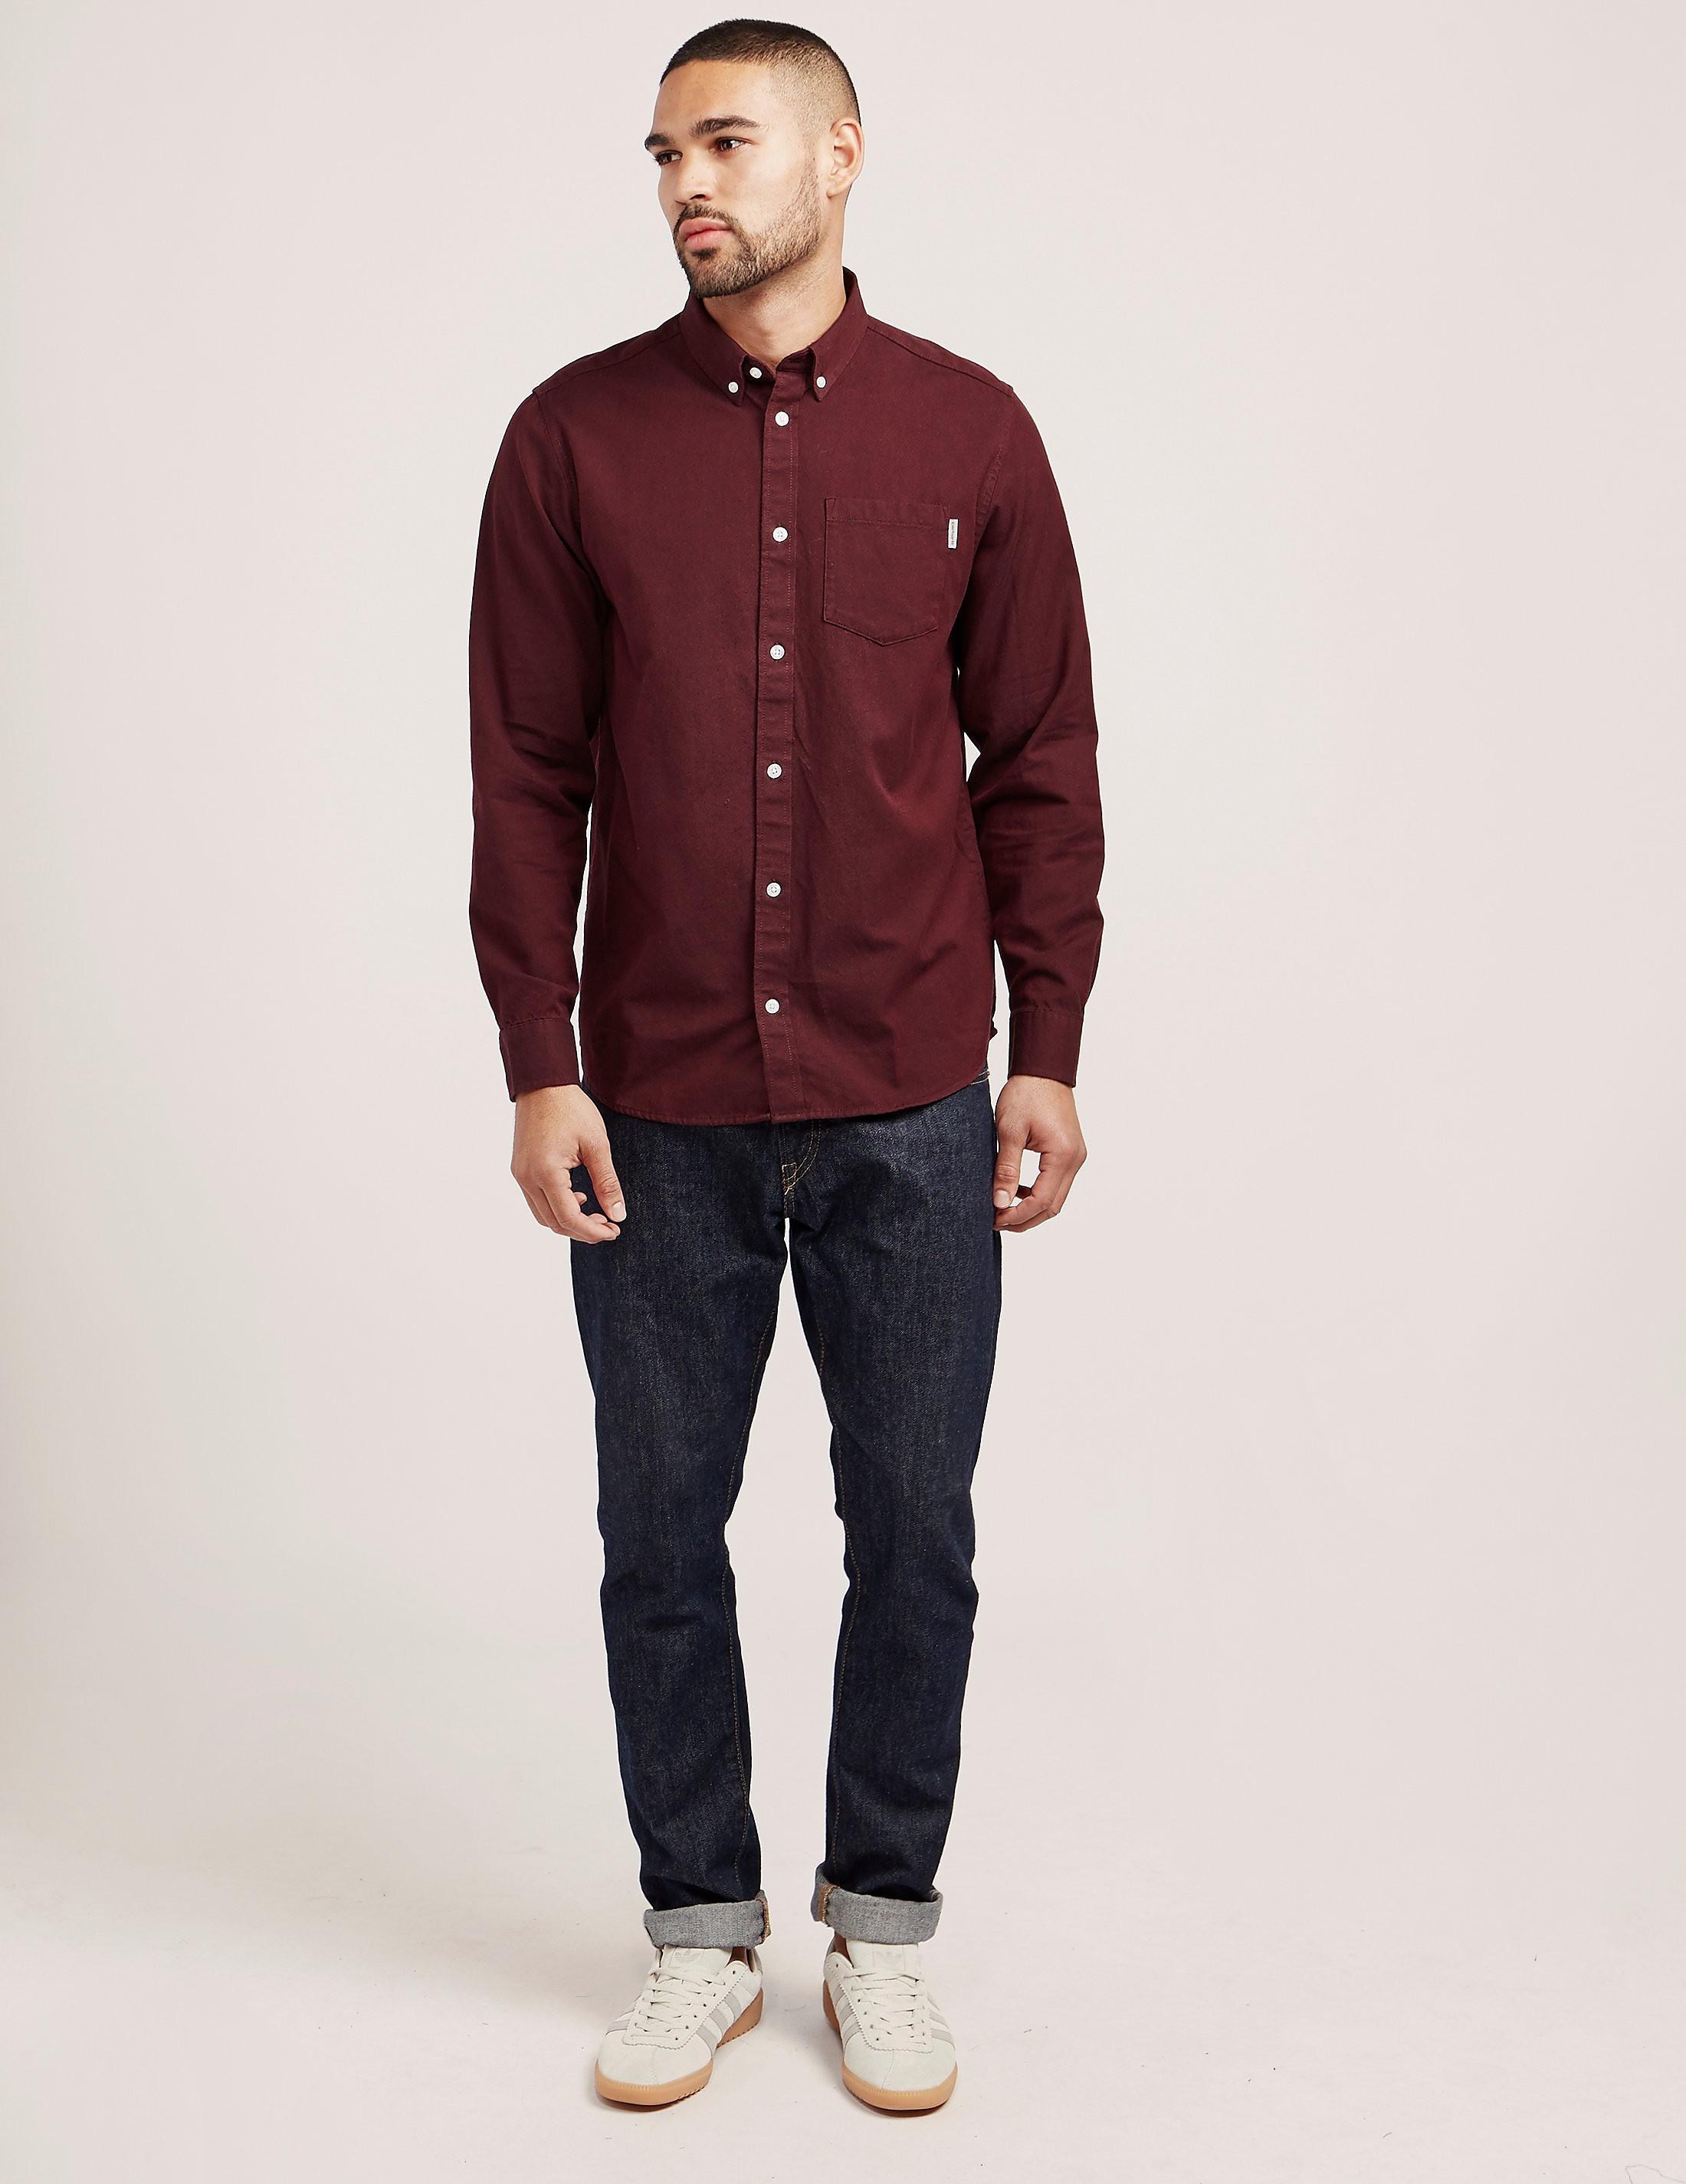 Carhartt WIP Dalton Oxford Long Sleeve Shirt